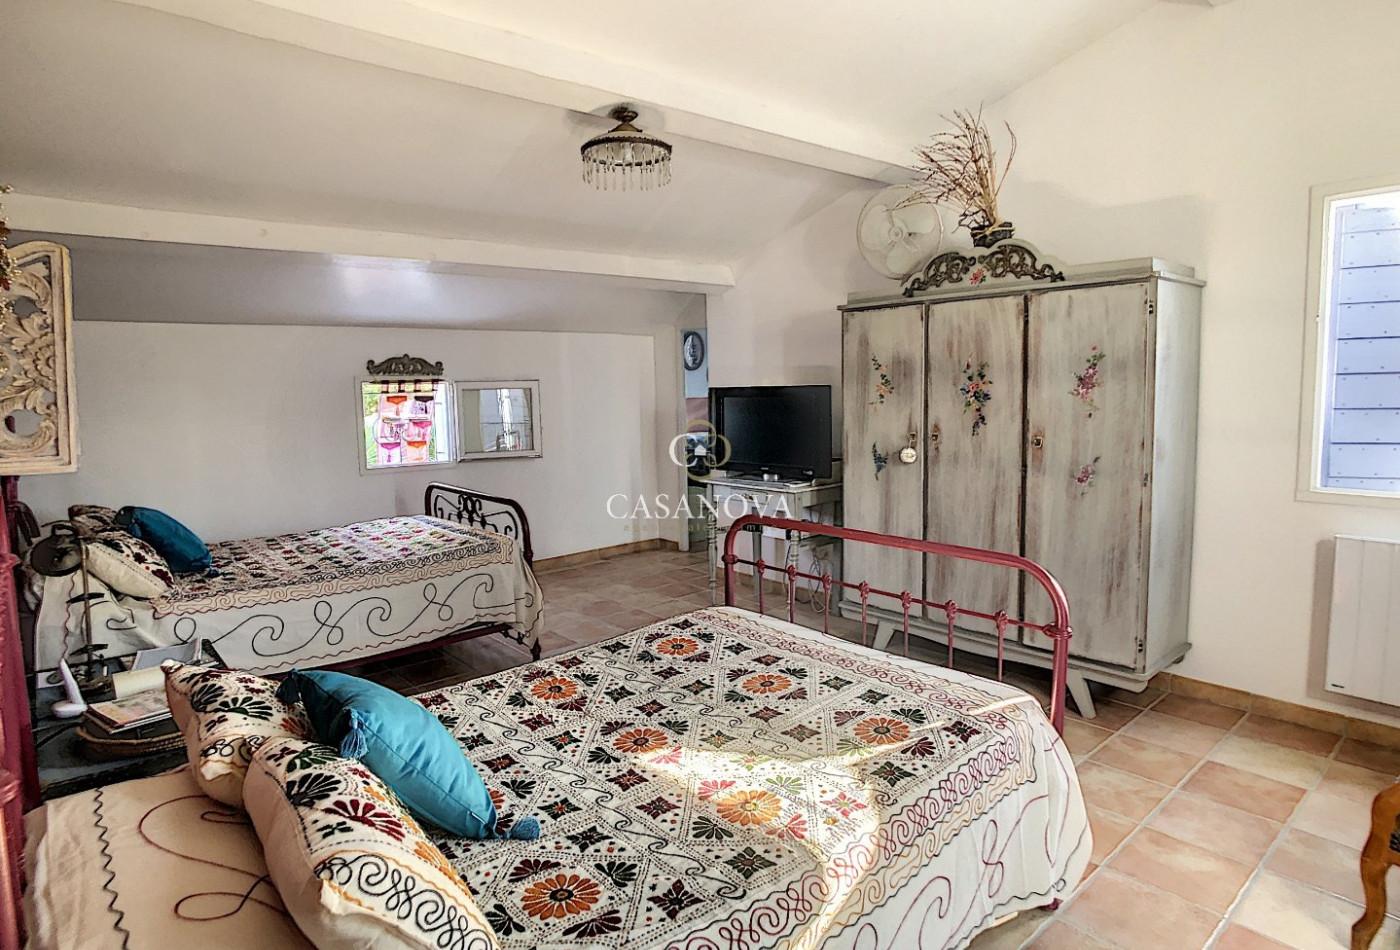 A vendre  Pezenas | Réf 340138080 - Agence galerie casanova